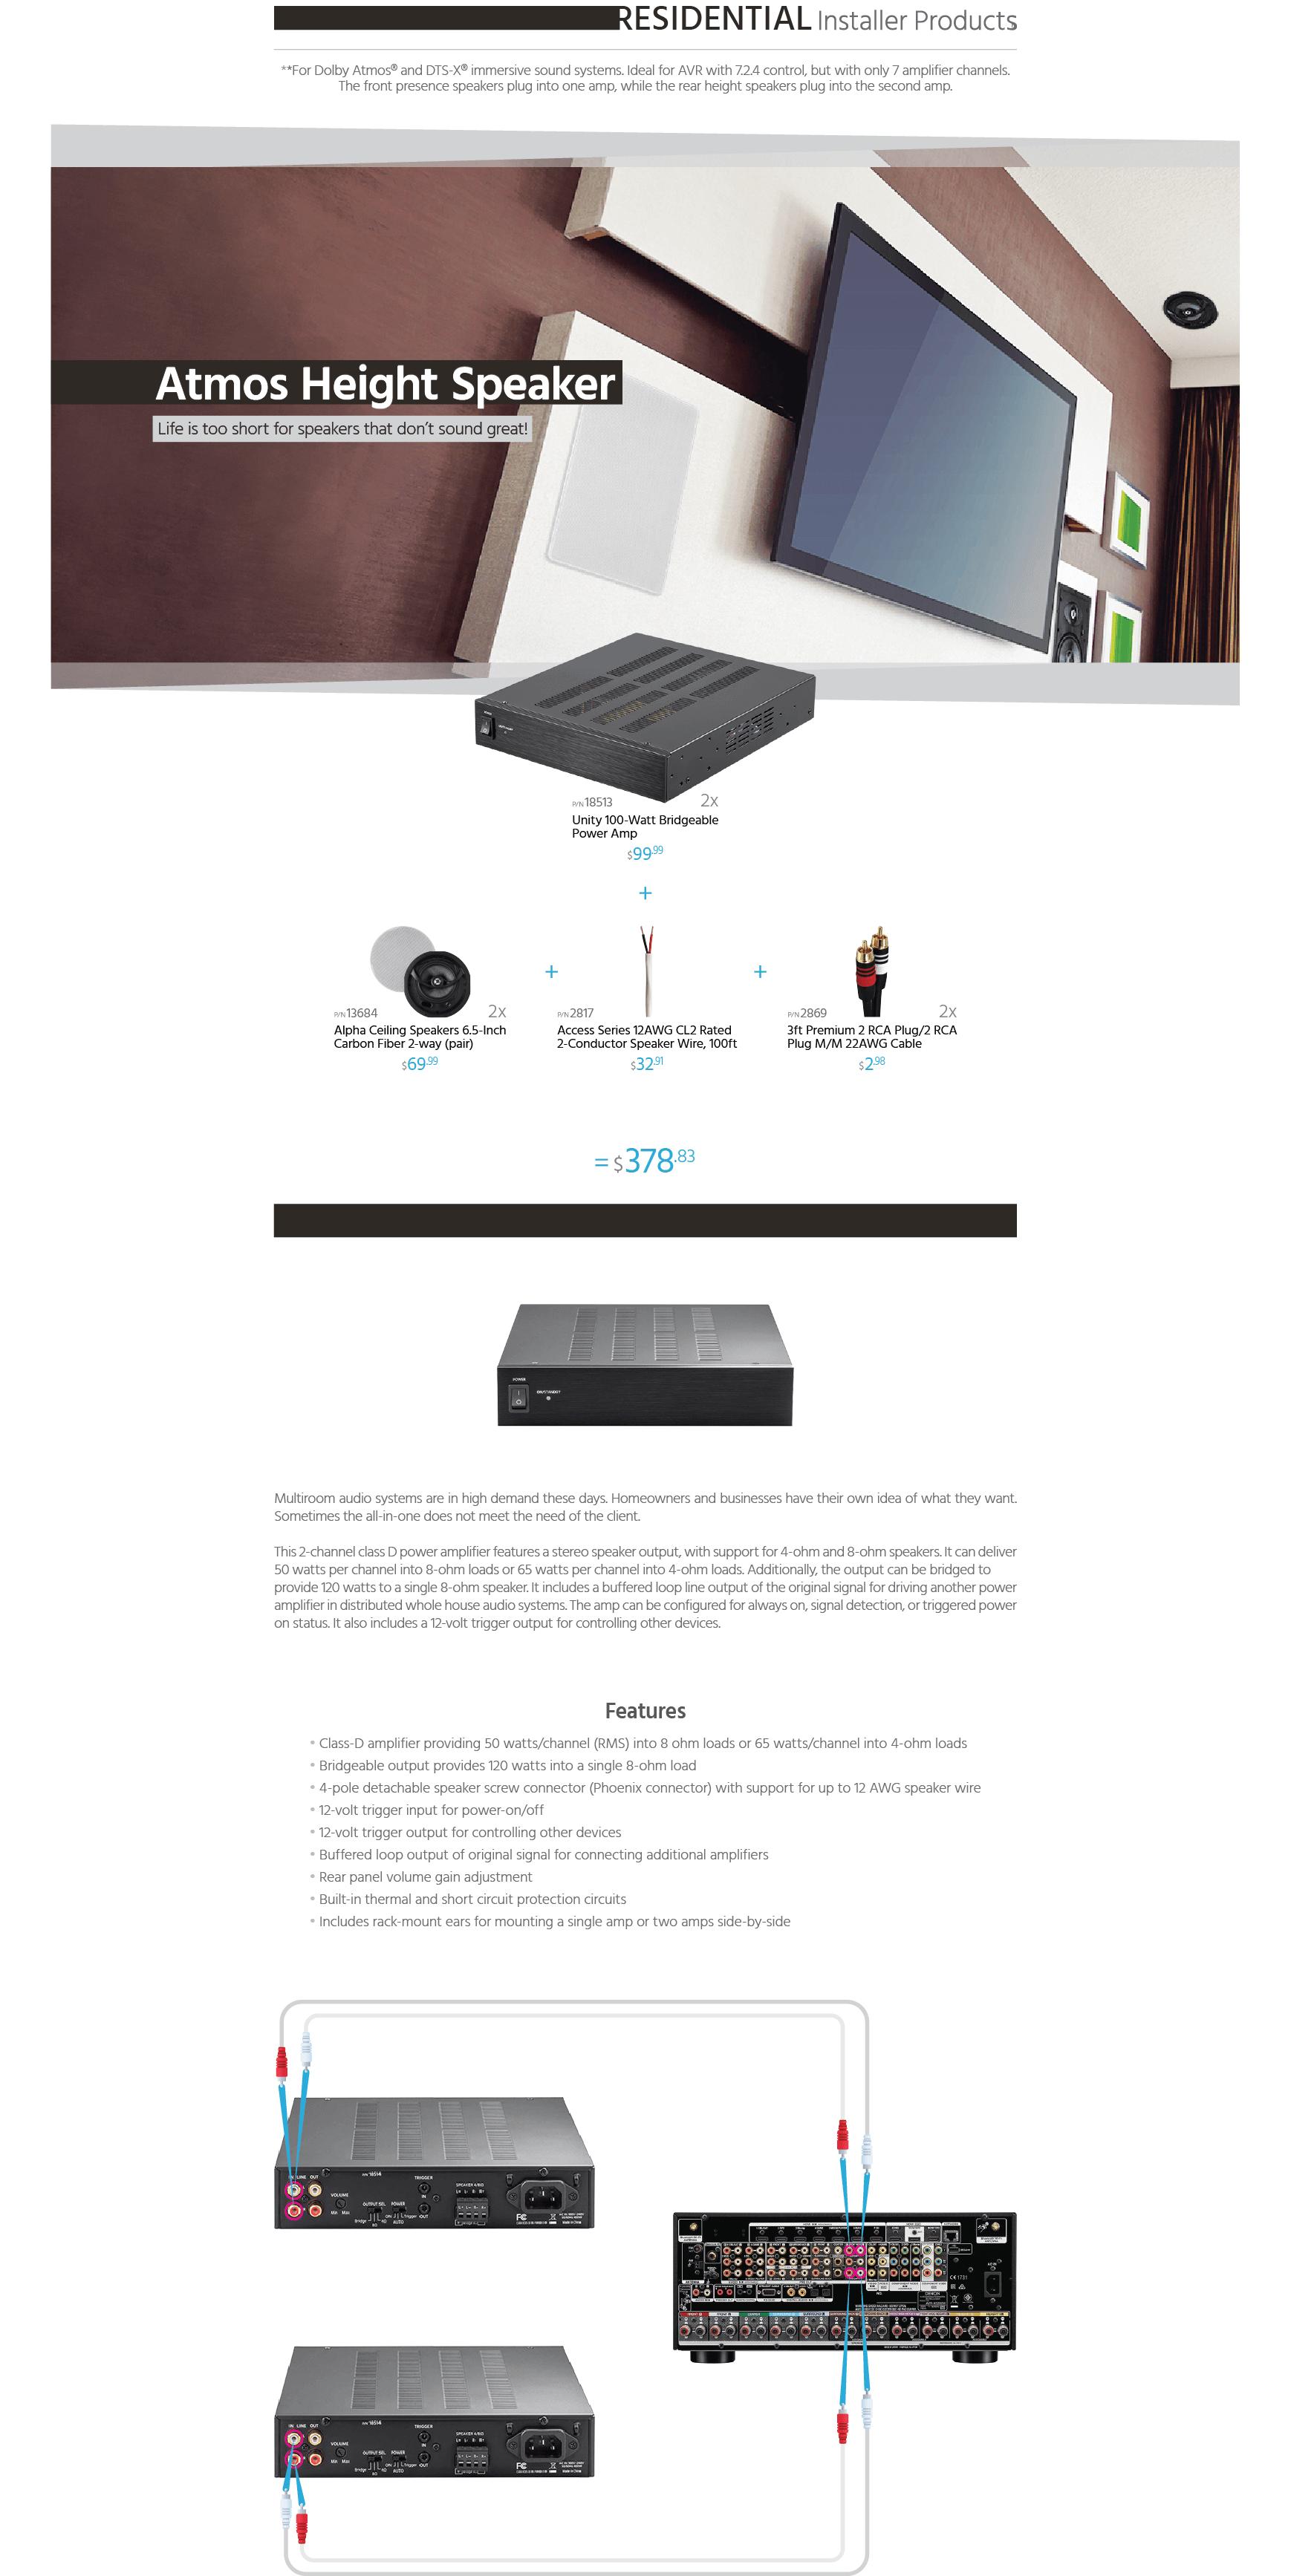 Monoprice Unity 100-Watt Bridgeable Power Amp - Monoprice.com